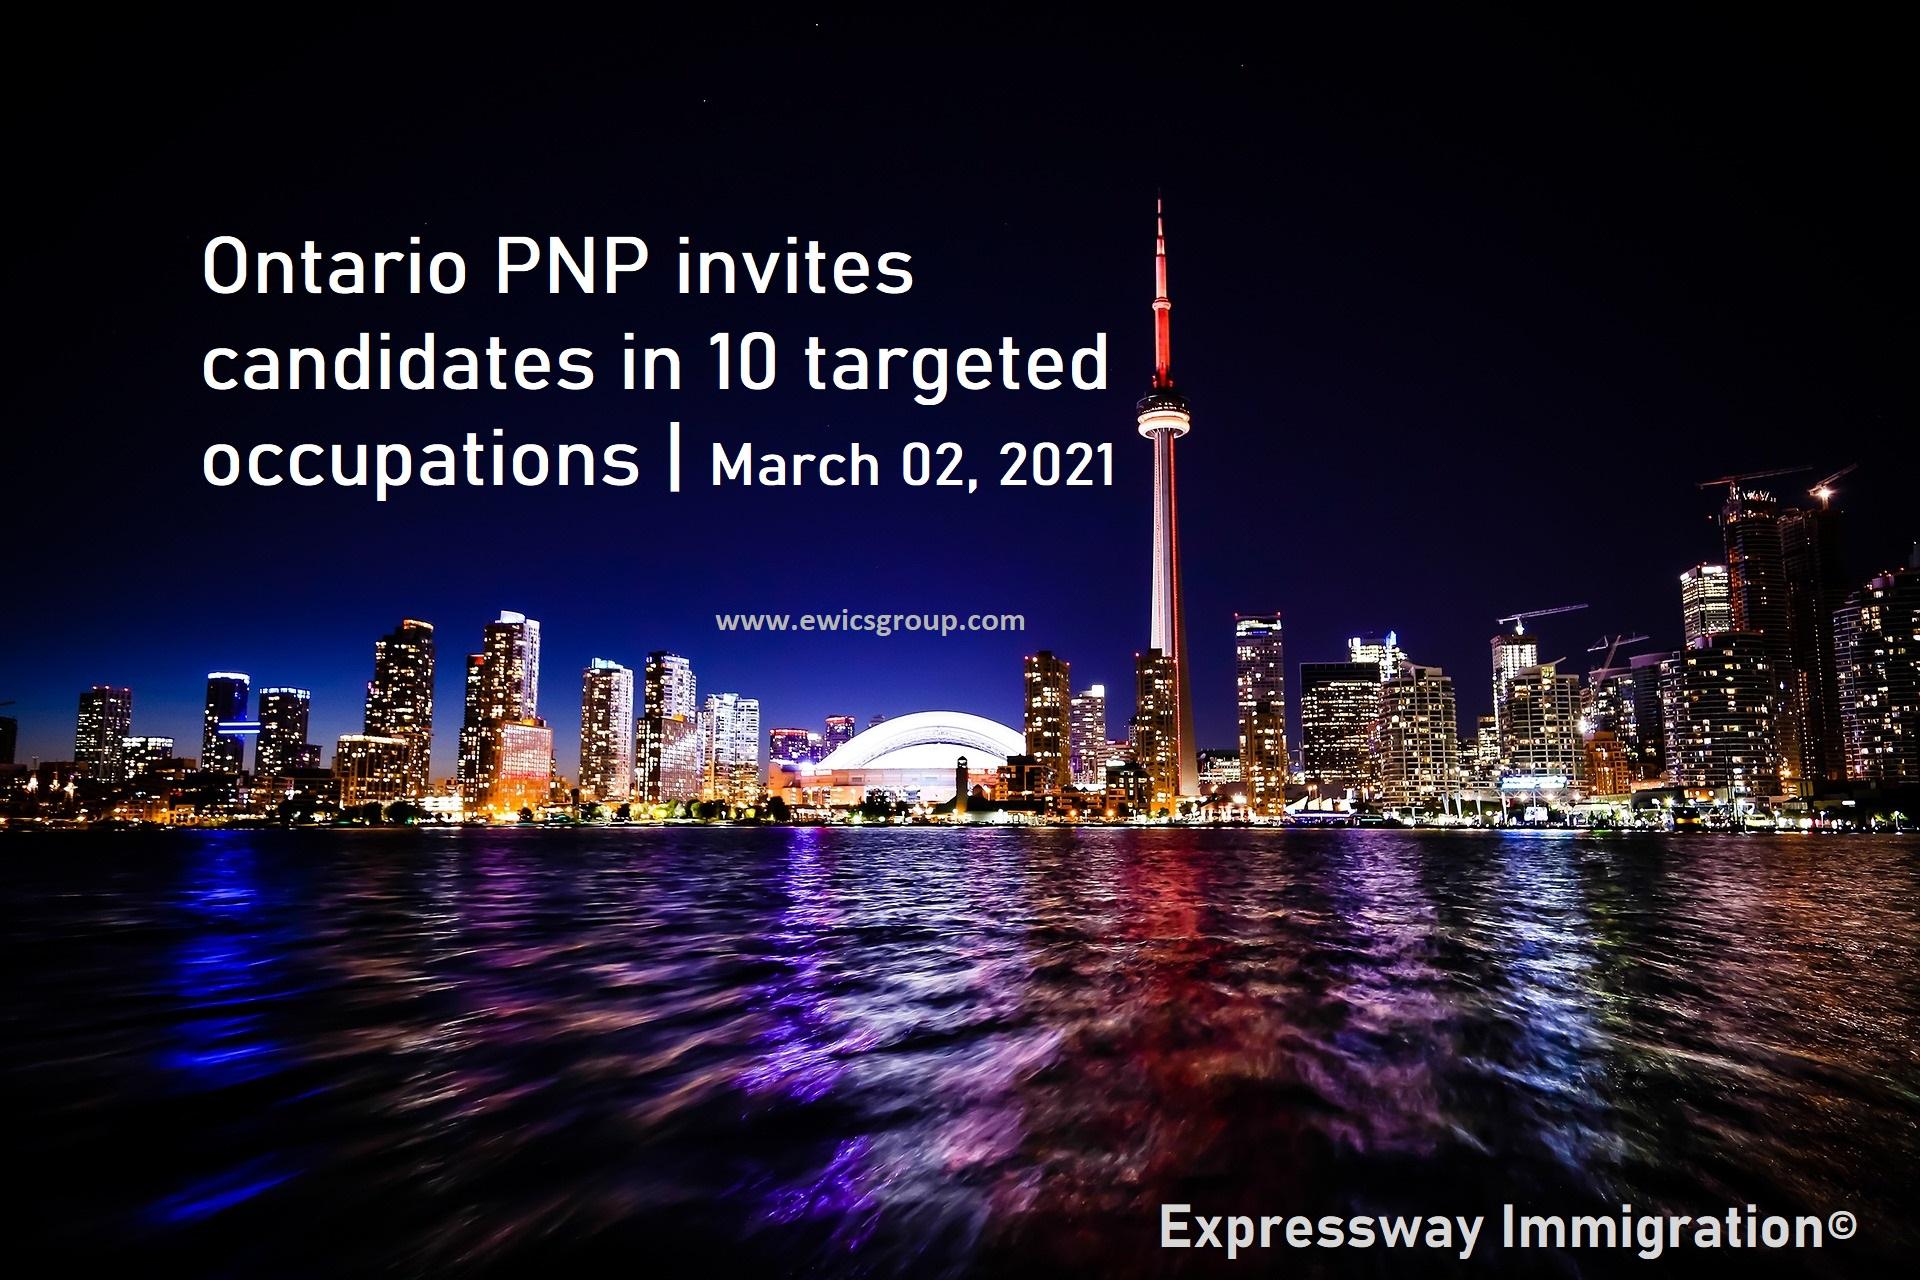 Ontario PNP latest draw updates